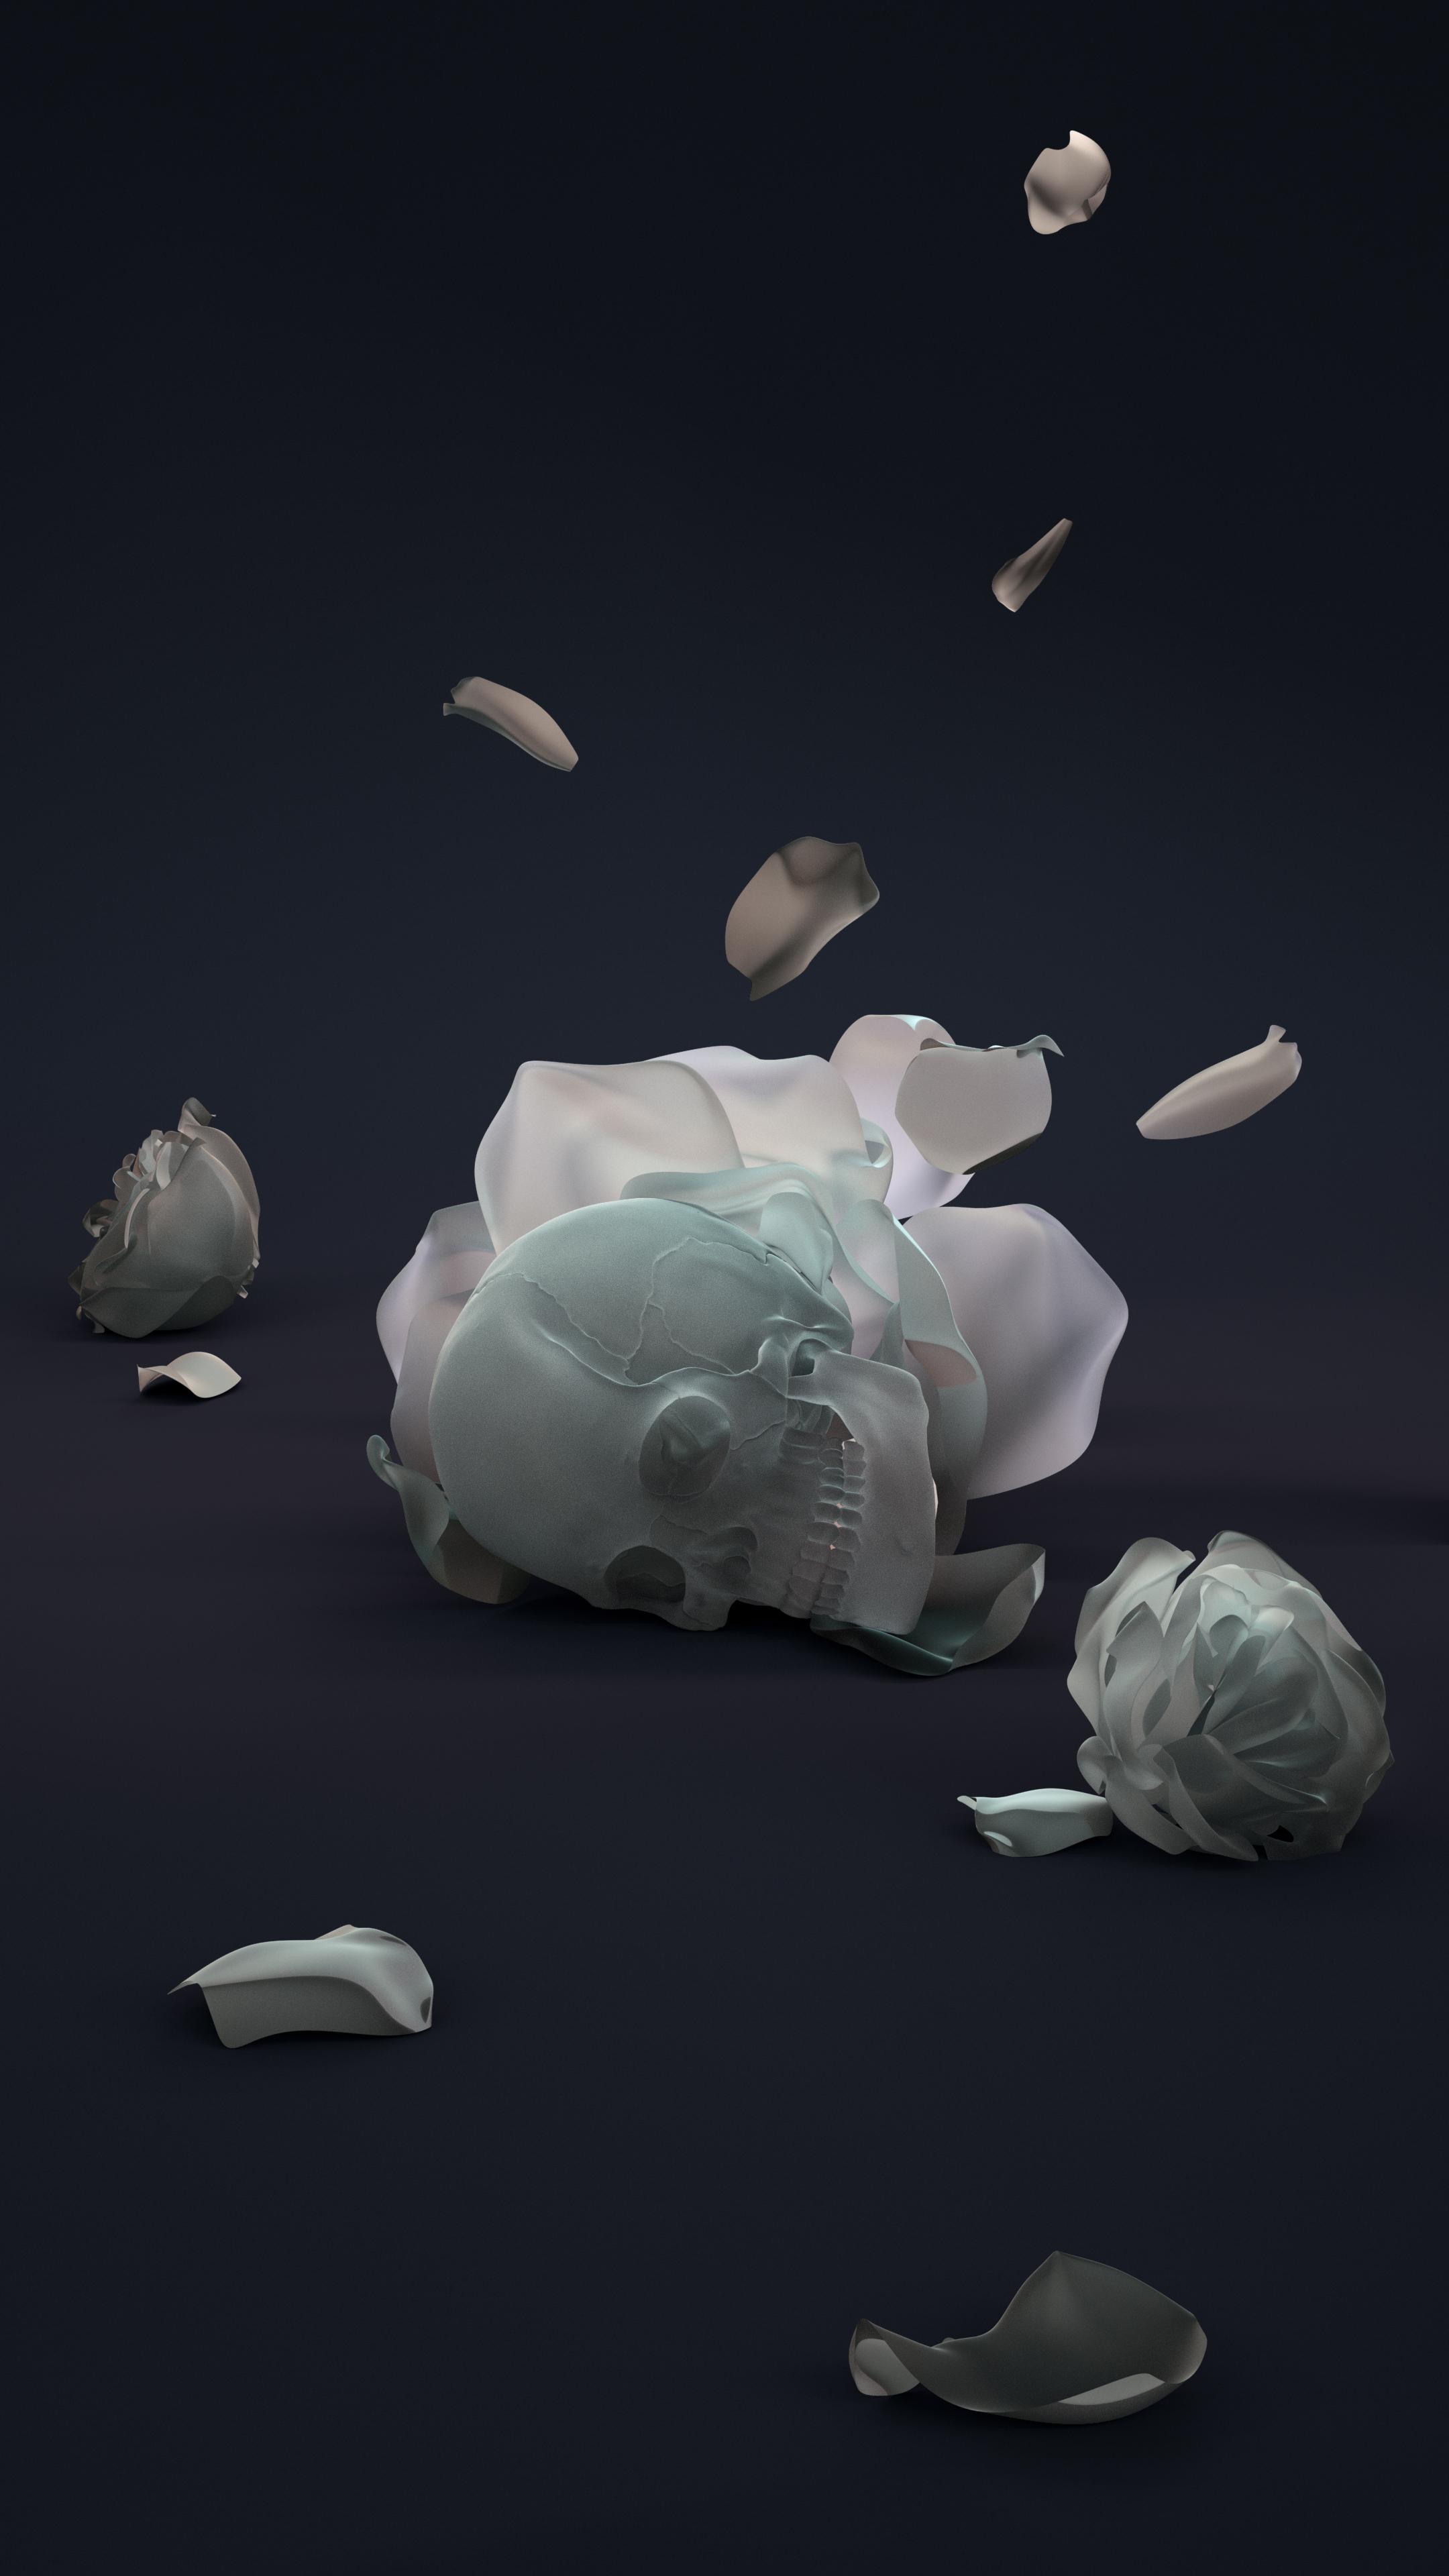 03_DEATH_FULL.jpg